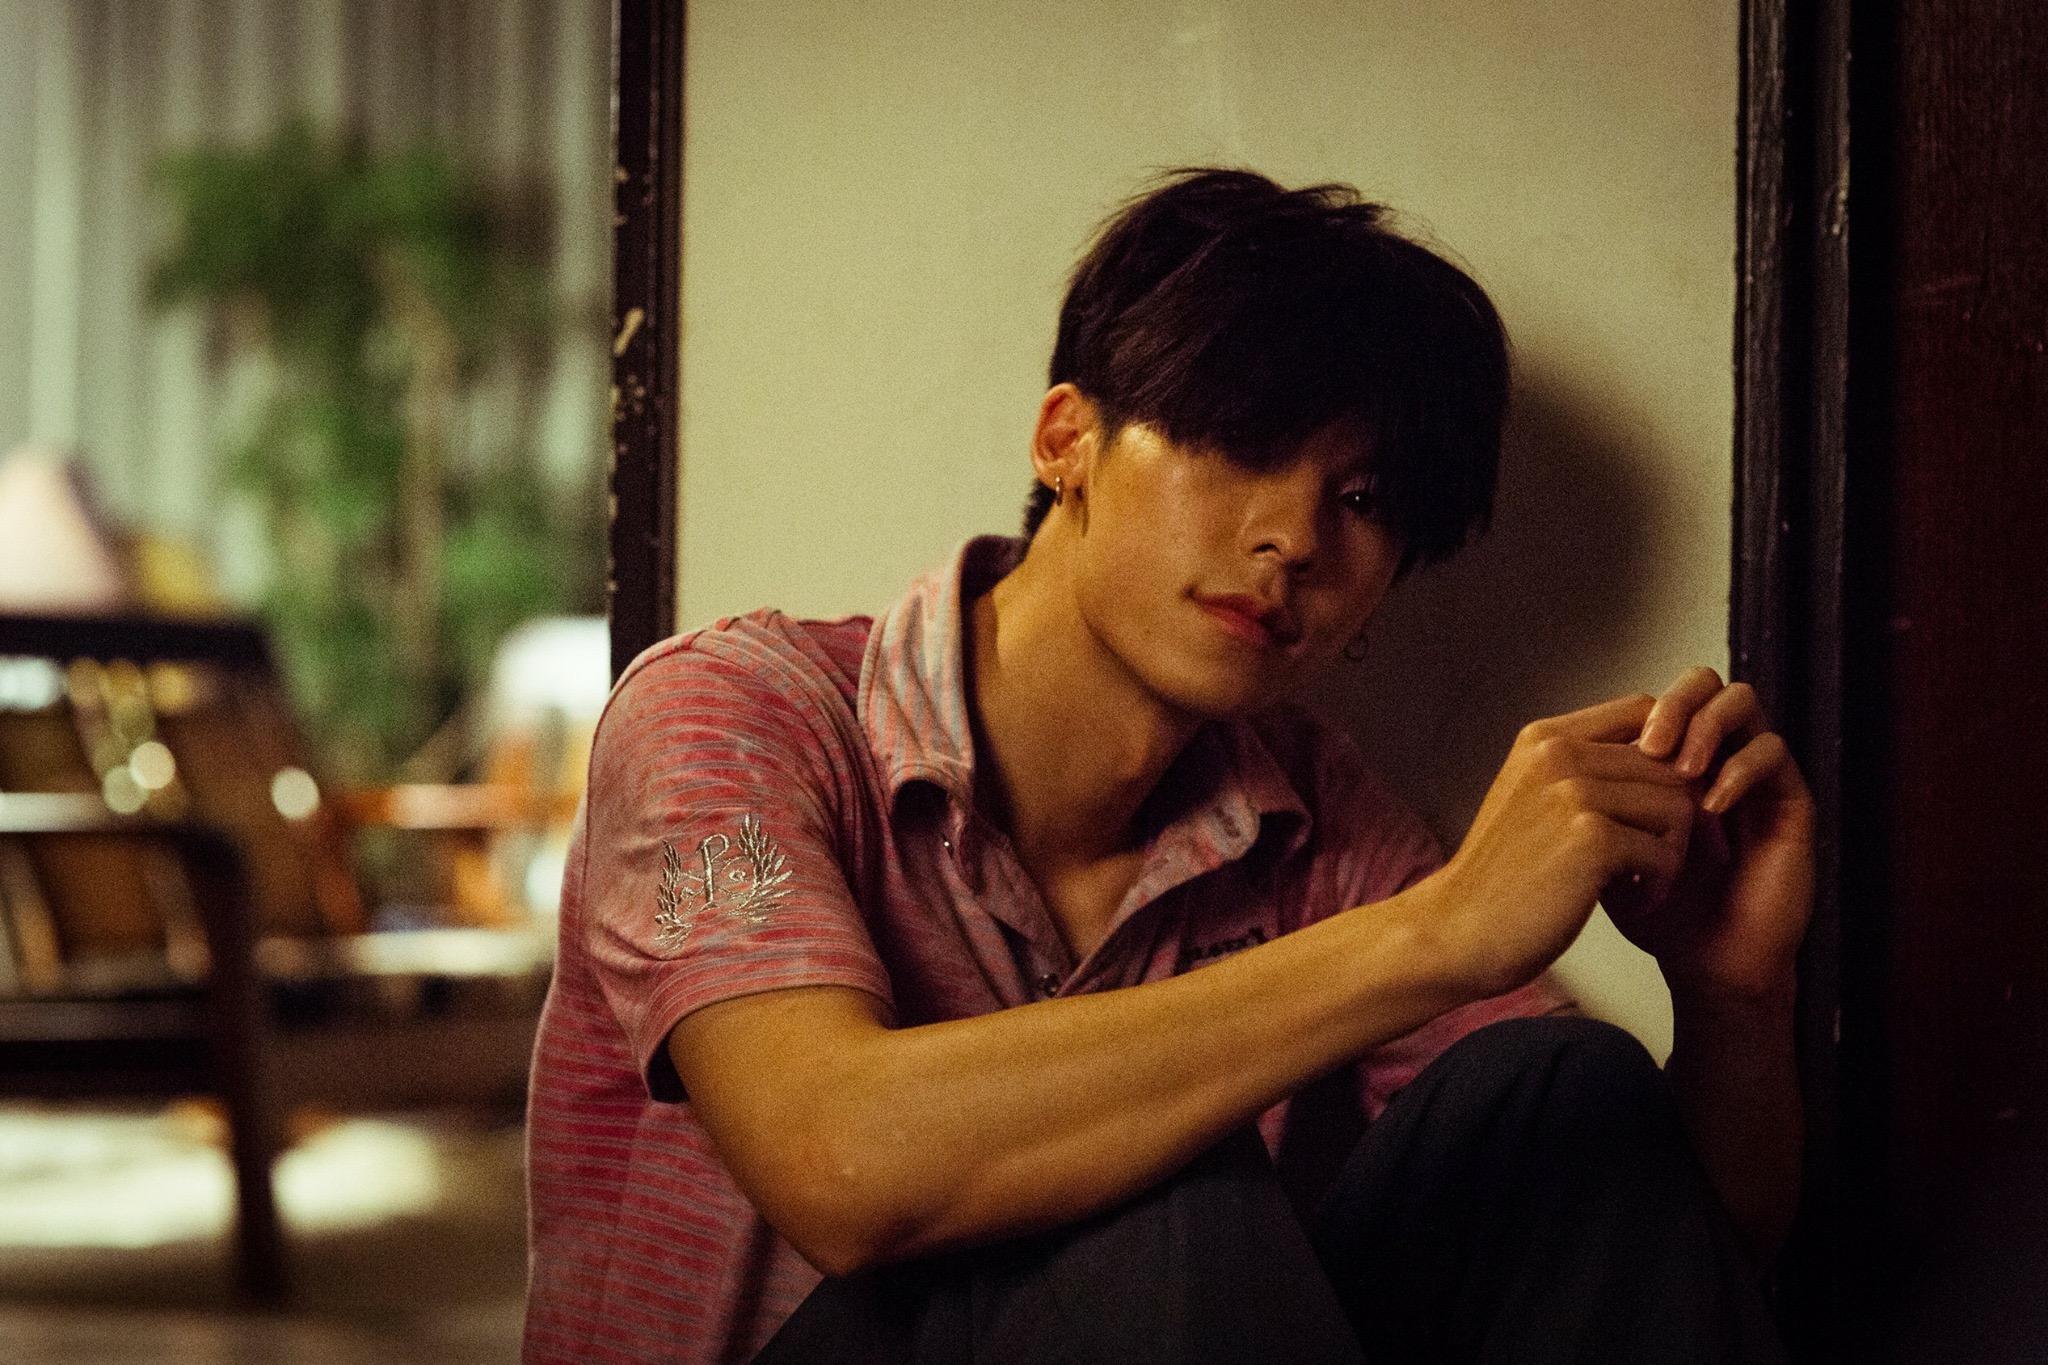 Greg Han Hsu in Jiang Teacher, You Talked About Love It (2016)